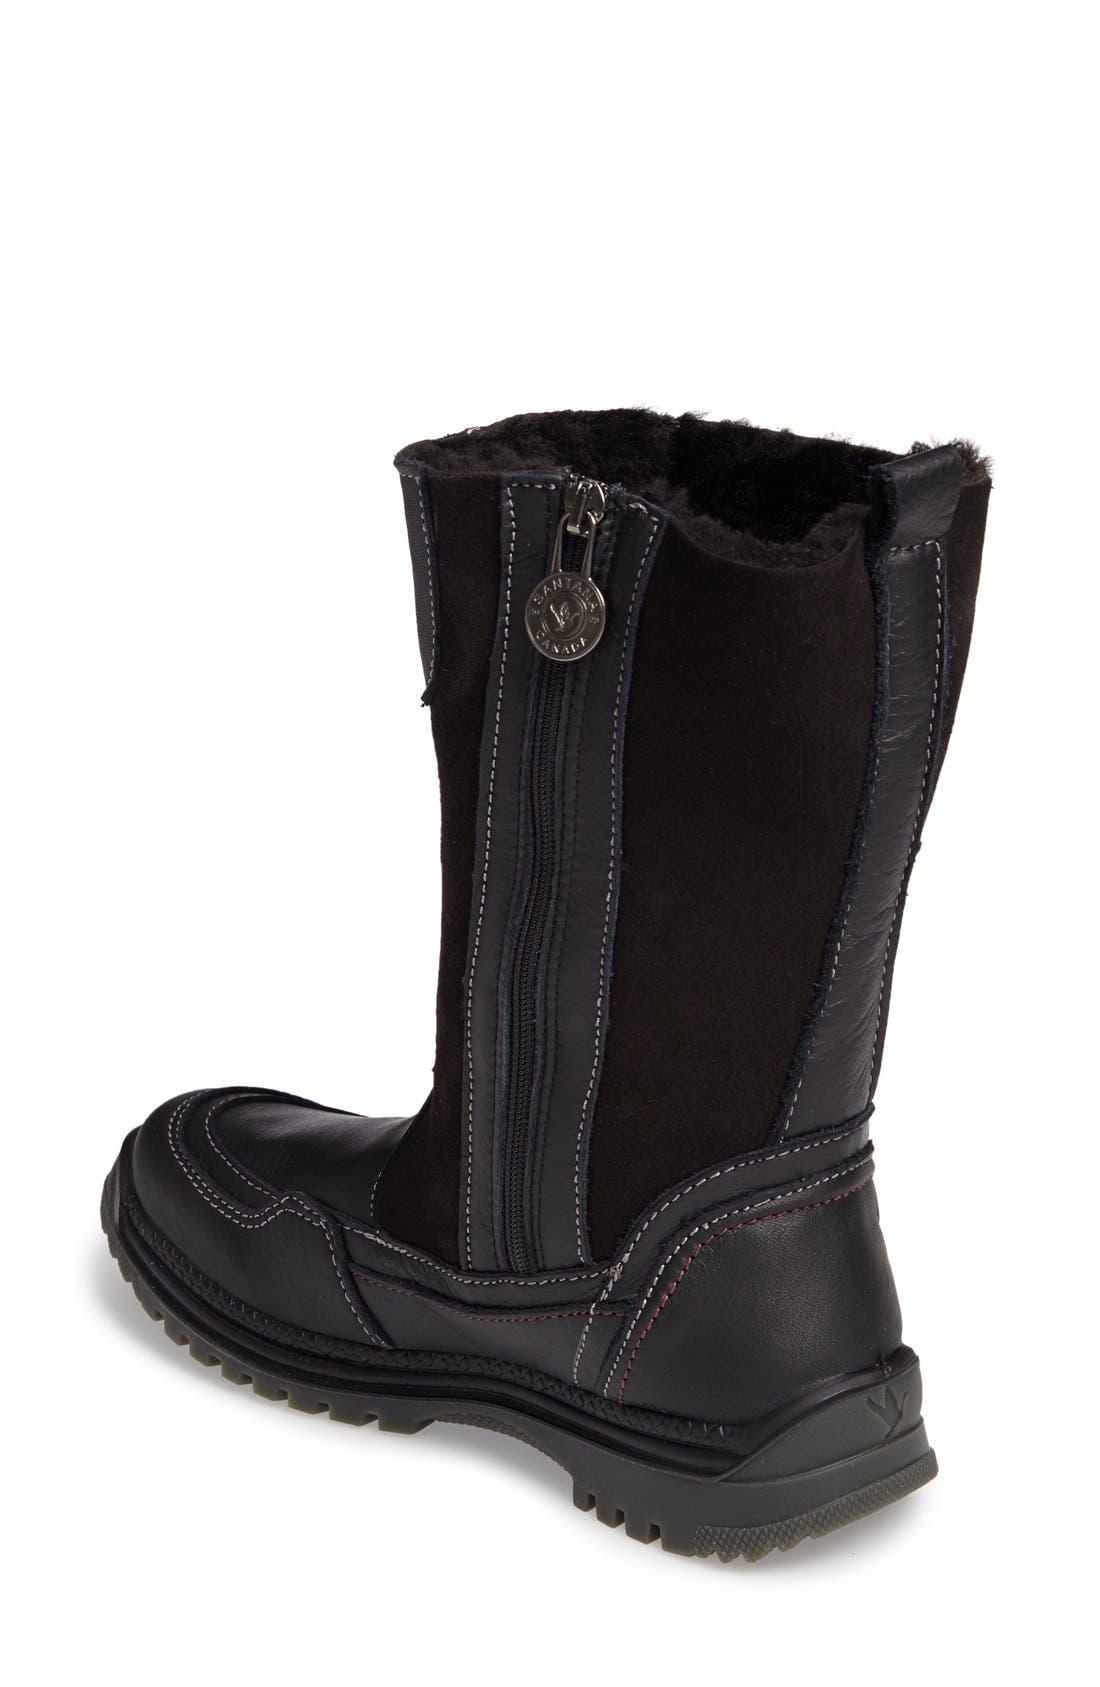 Seraphine Genuine Shearling Waterproof Winter Boot,                             Alternate thumbnail 6, color,                             001